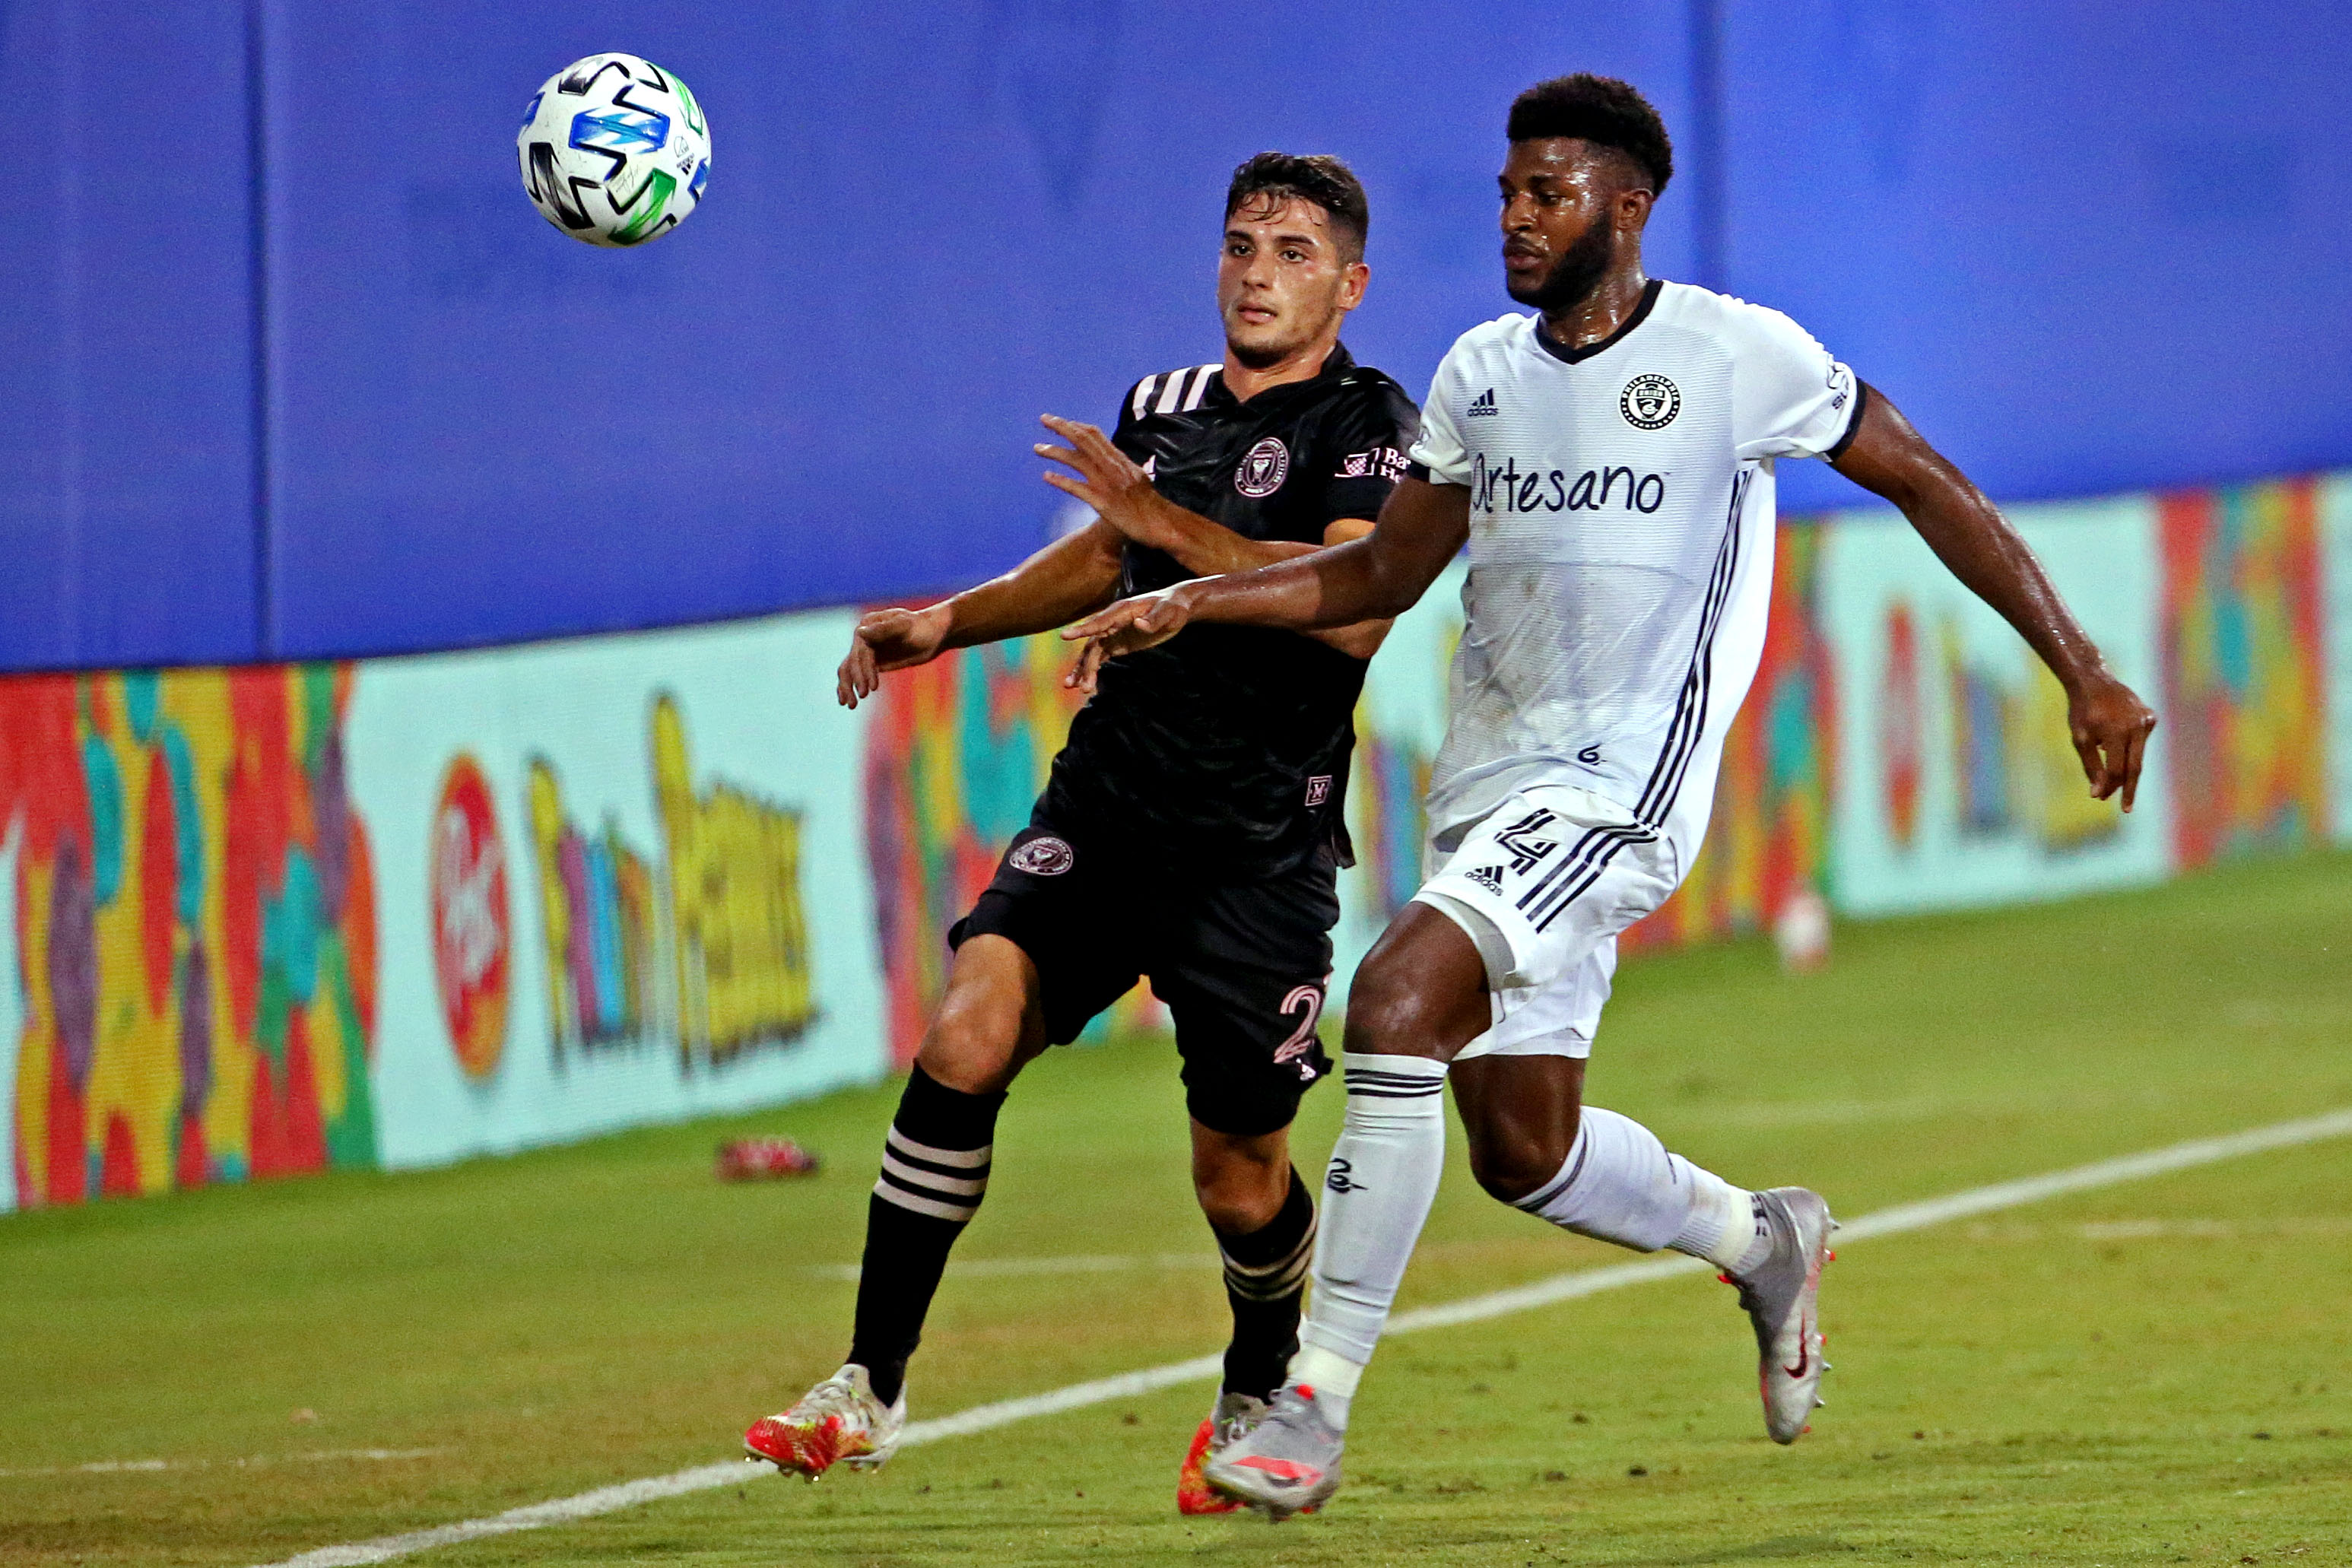 MLS: Inter Miami CF at Philadelphia Union